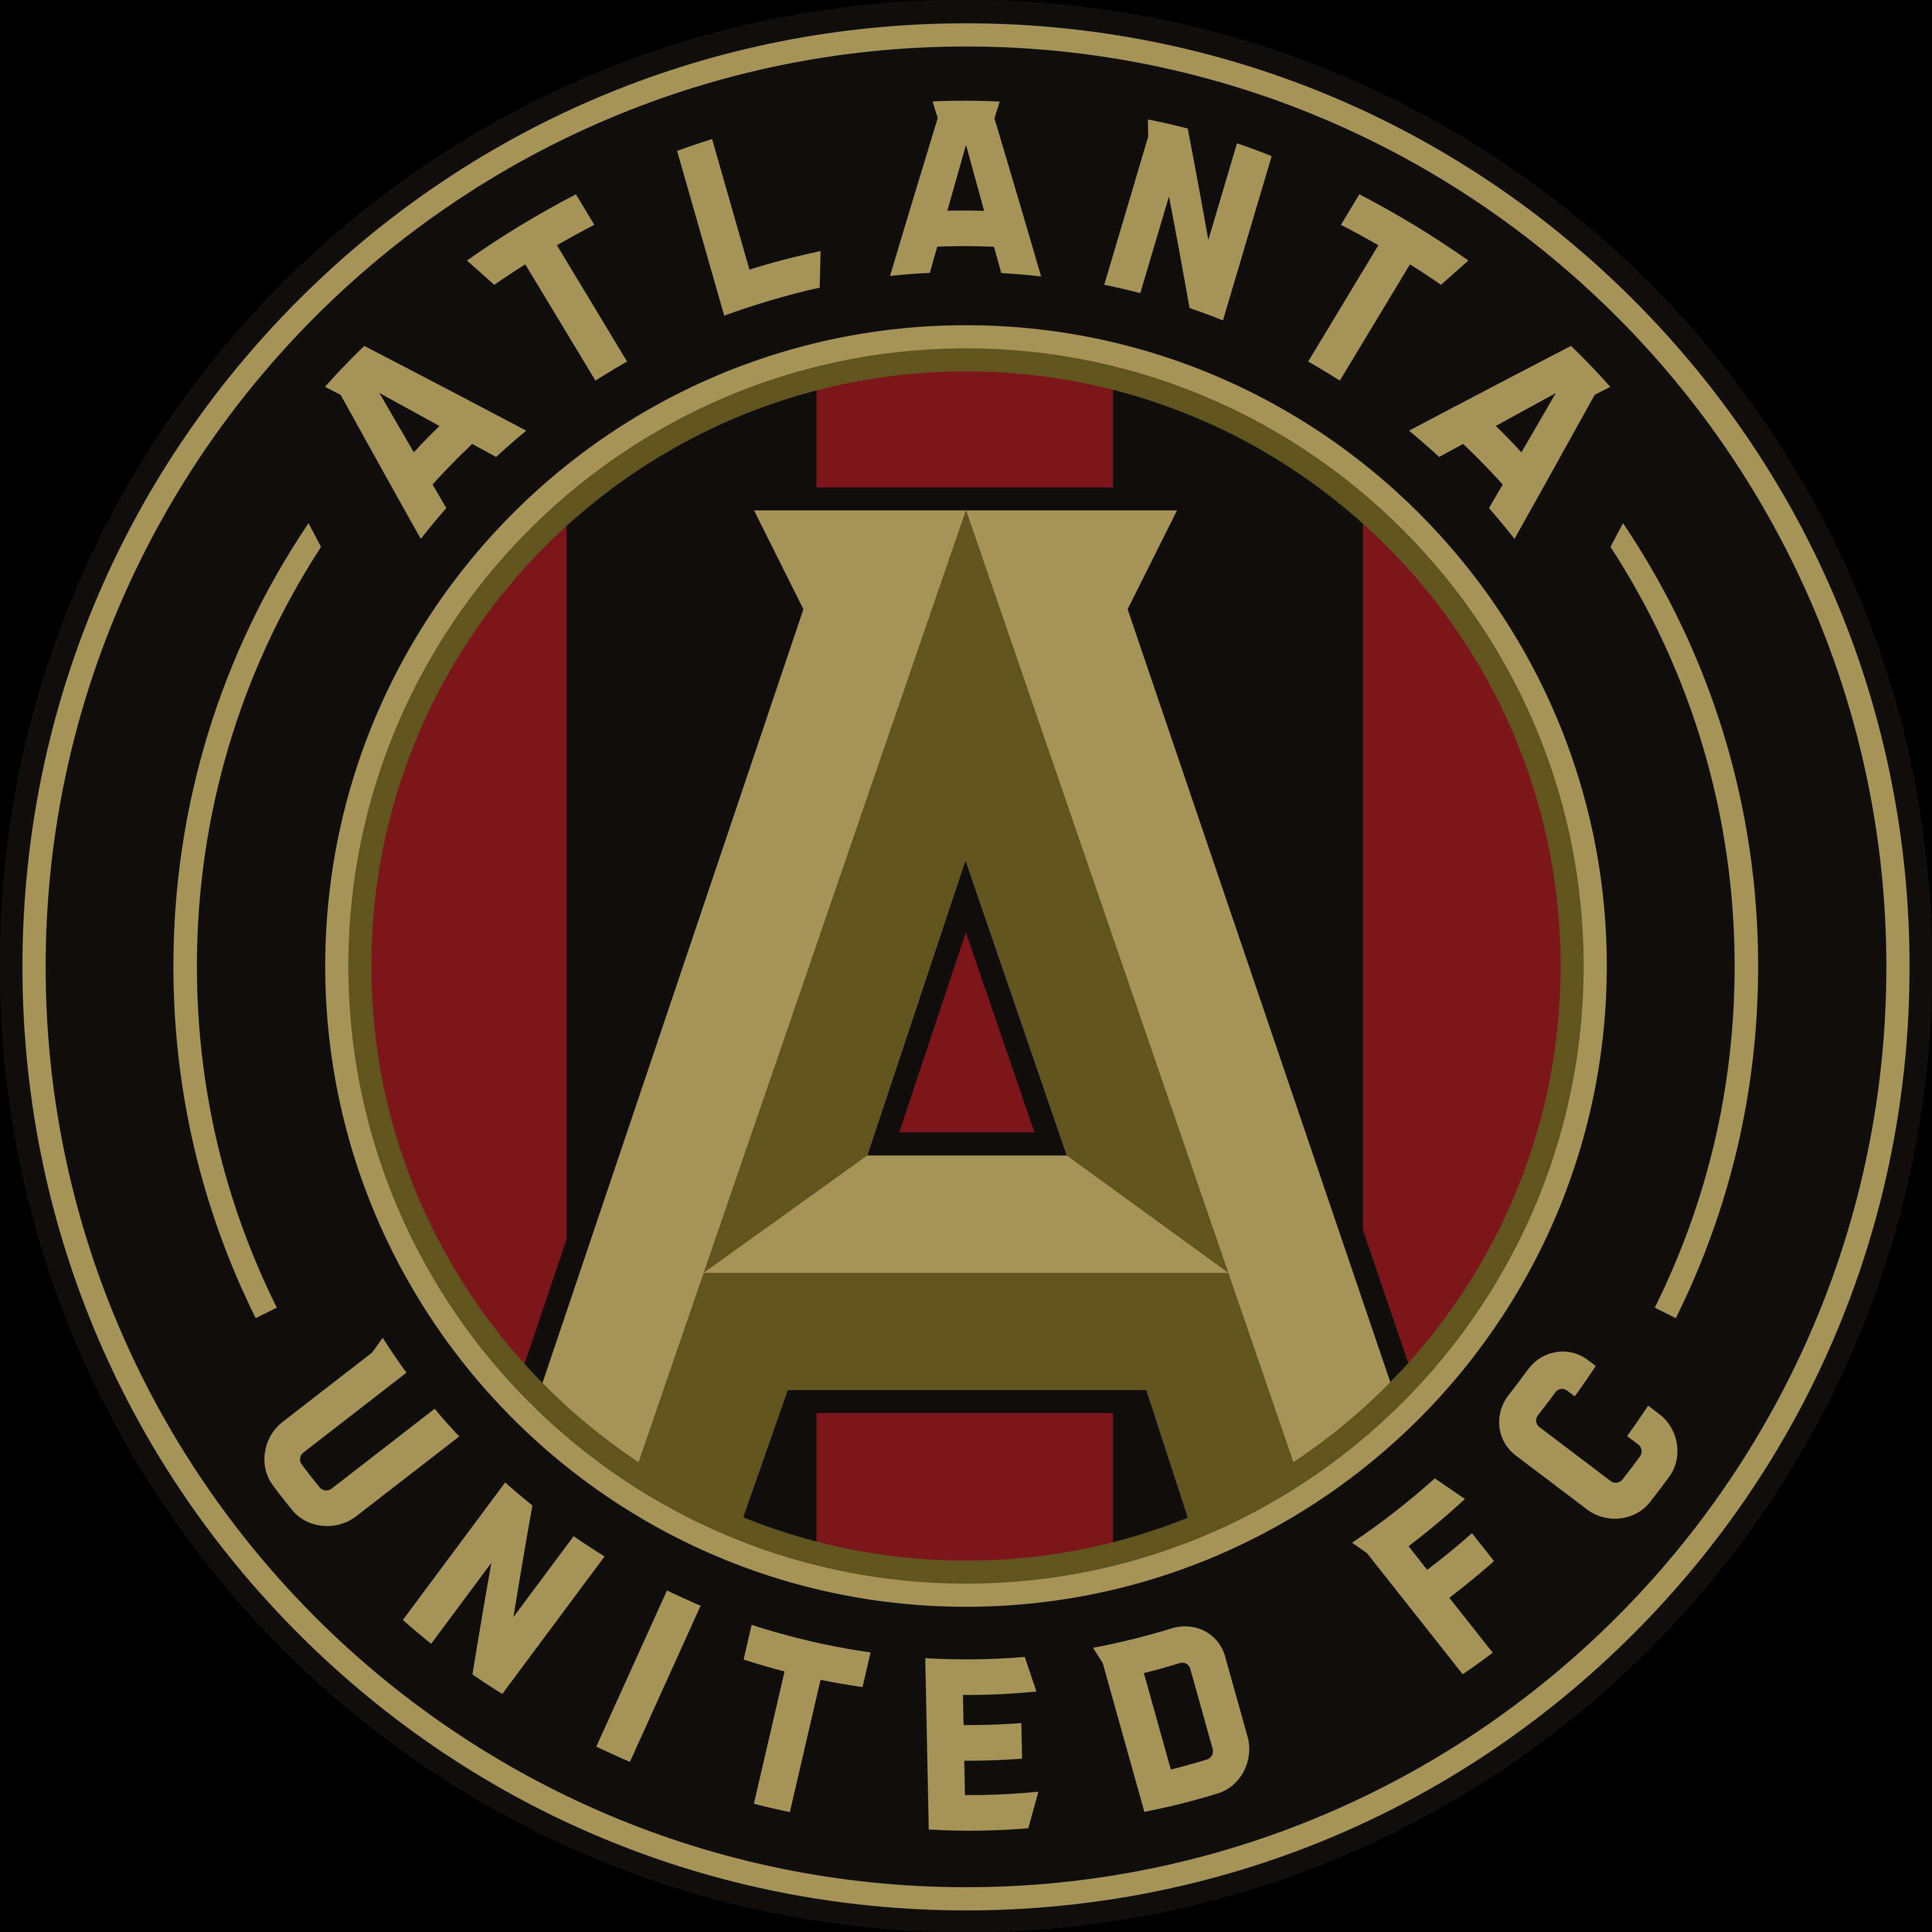 atlanta united fc logo - Atlanta United FC Logo